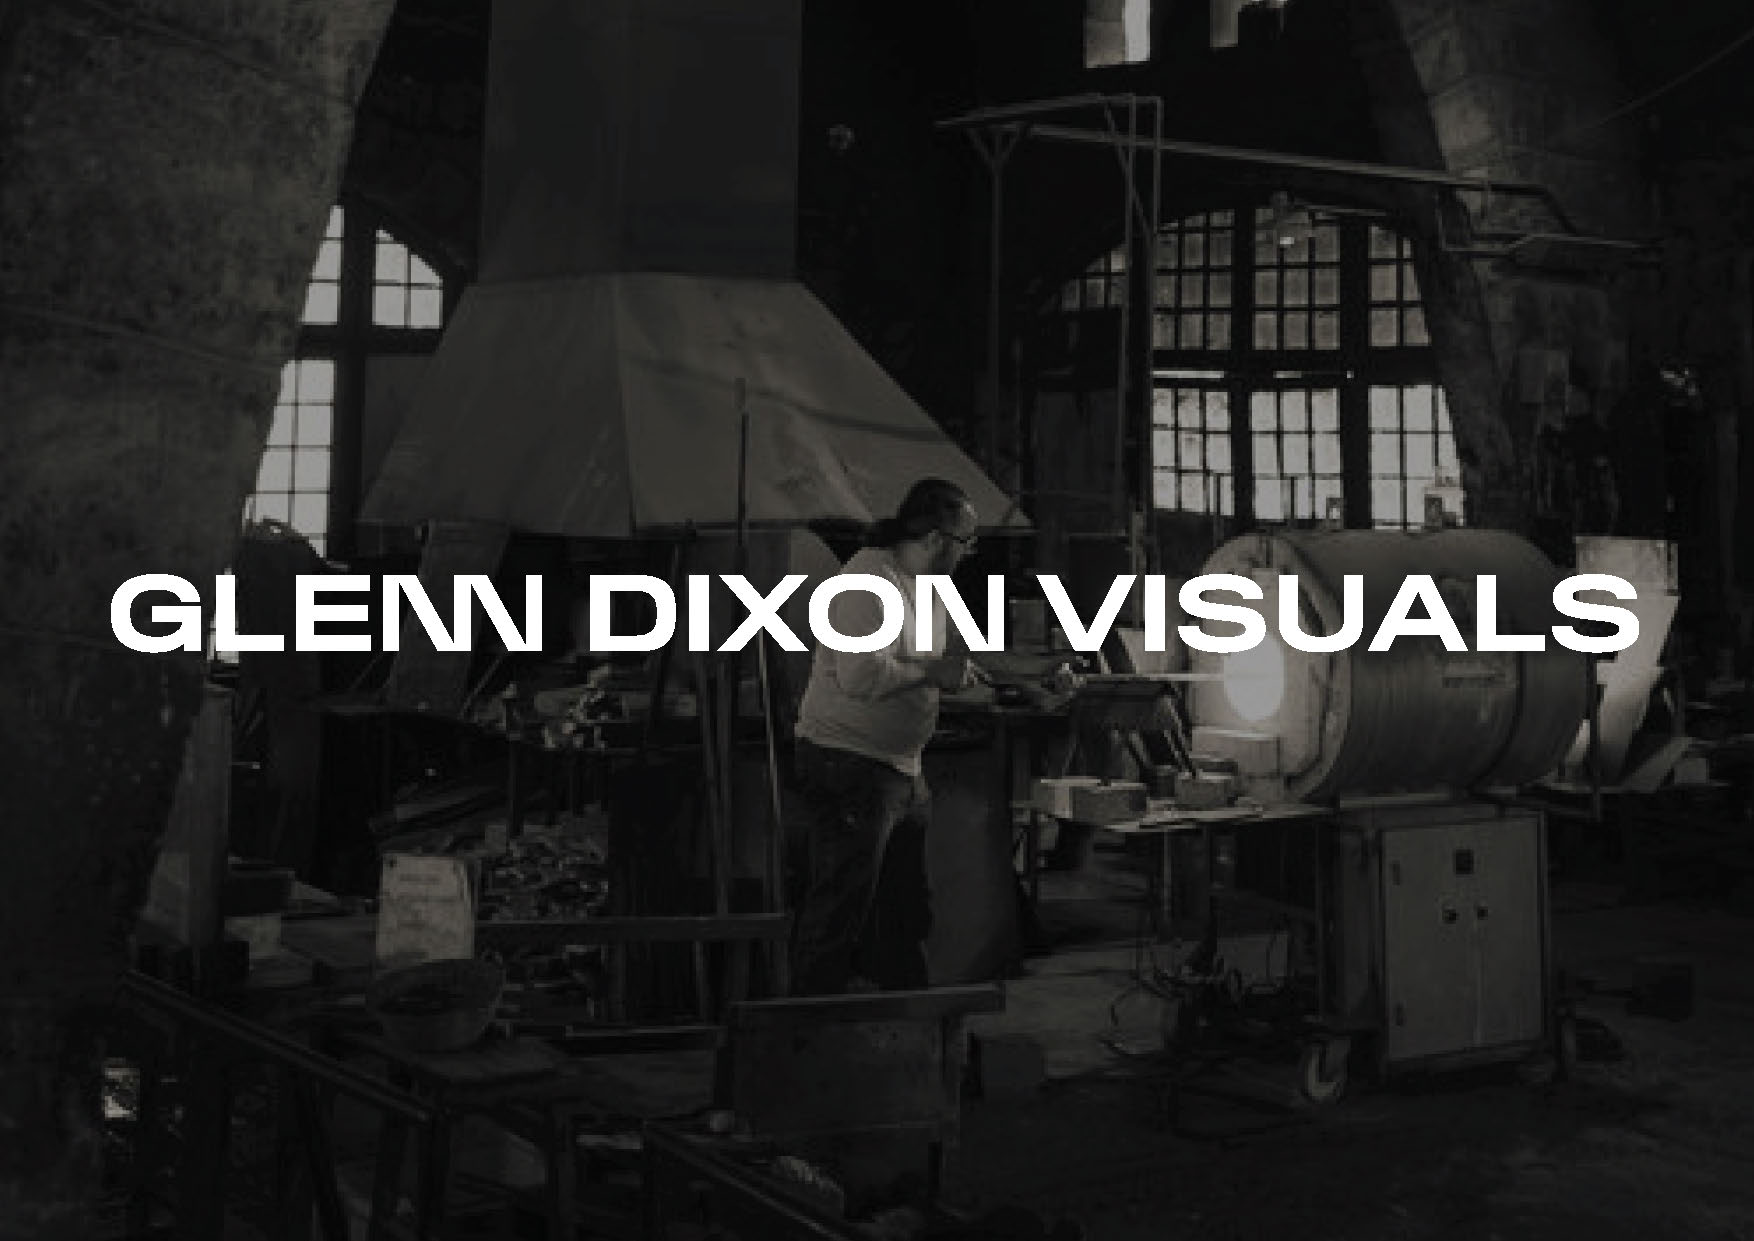 CD_Glenn Dixon Visuals_Page_15.jpg